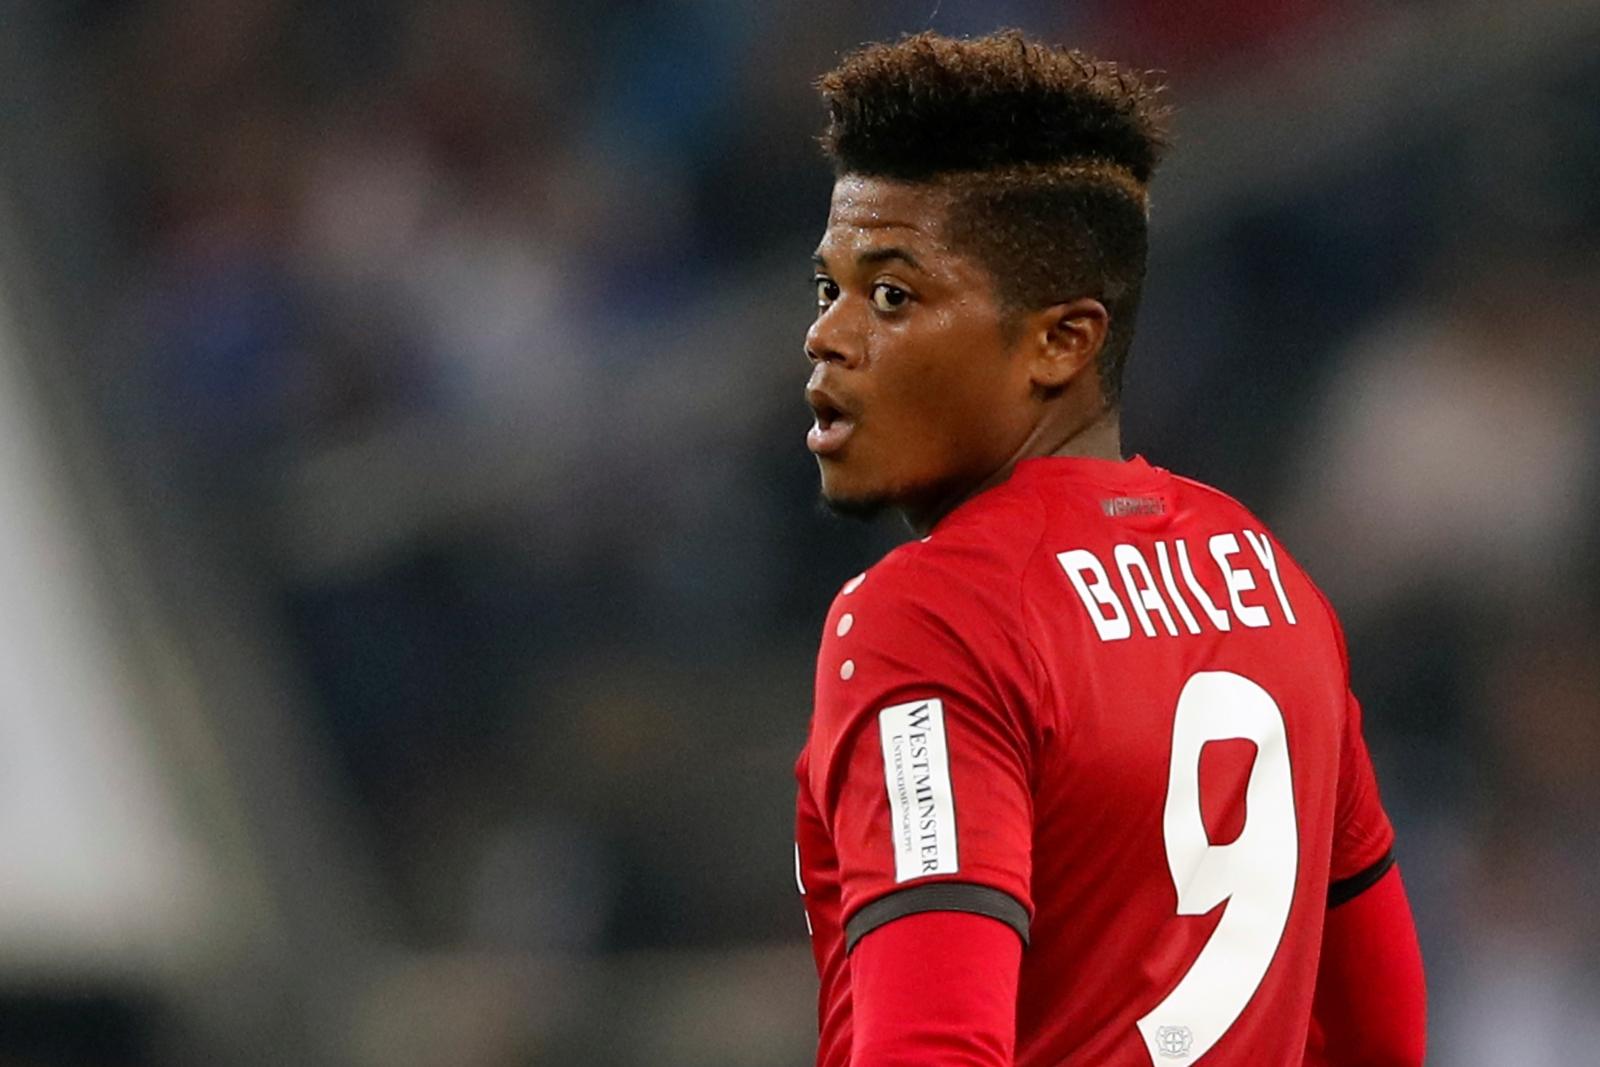 Bayern Leverkusen Star Leon Bailey Reveals Premier League